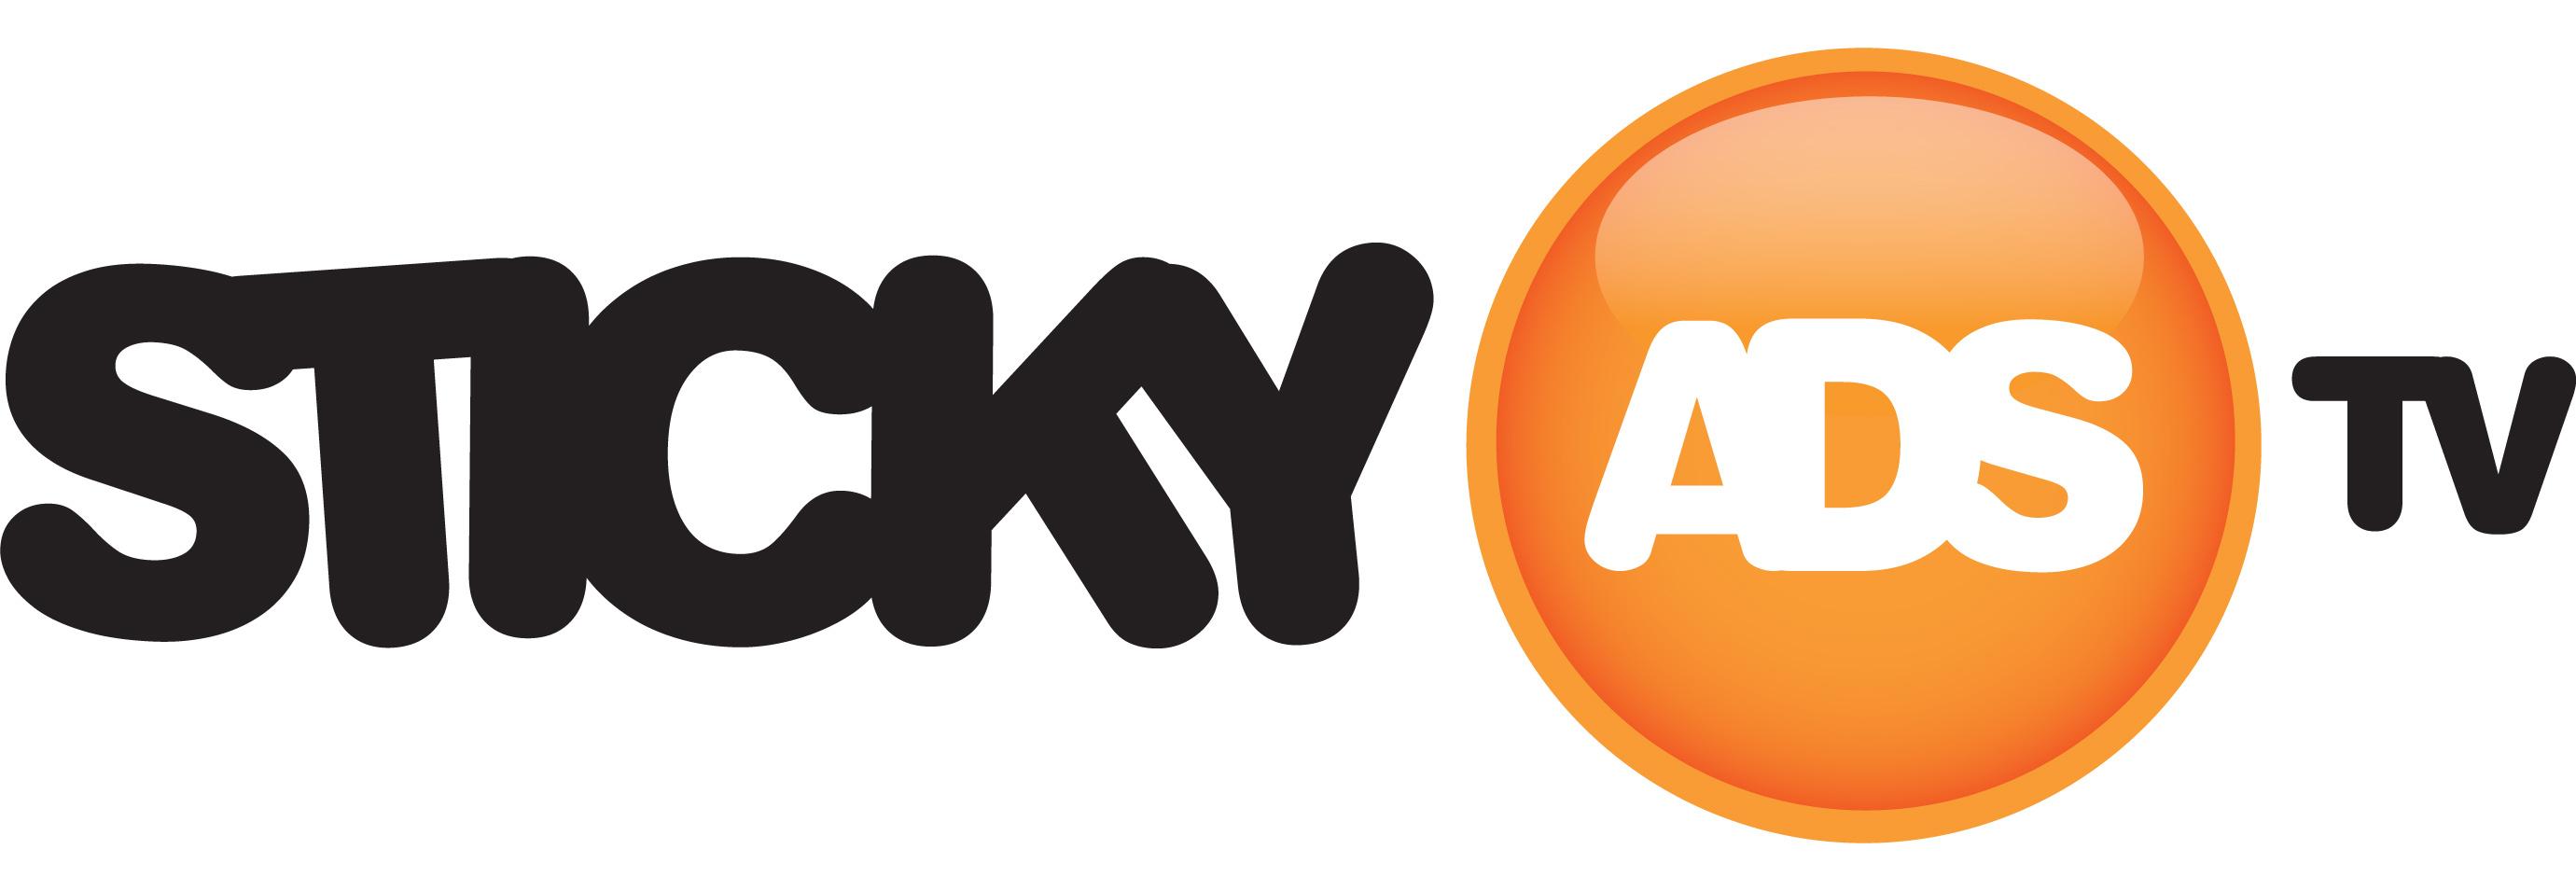 https://i0.wp.com/frenchweb.fr/wp-content/uploads/2011/05/logo-StickyADStv.jpg